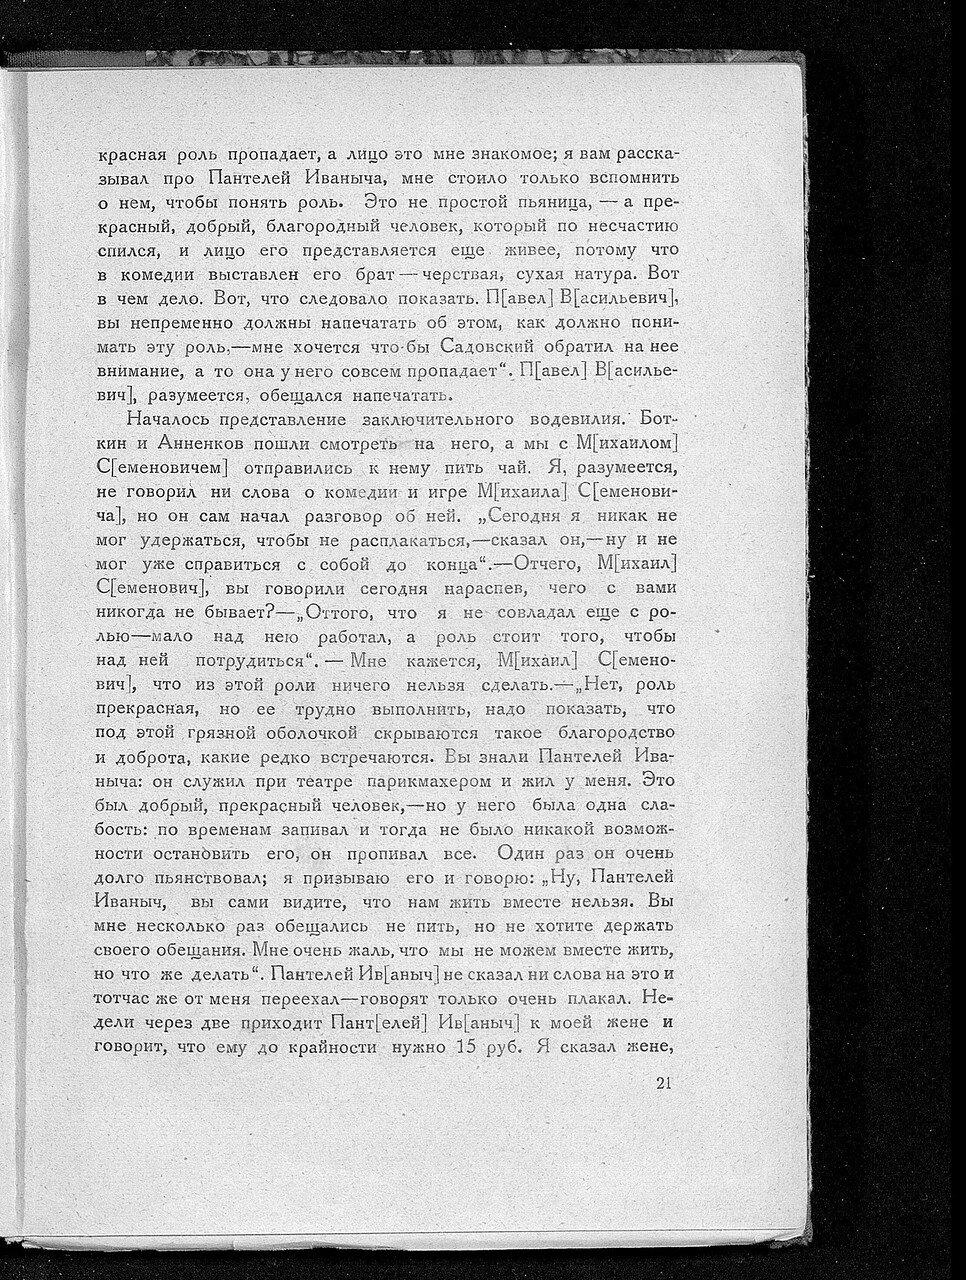 https://img-fotki.yandex.ru/get/931298/199368979.a0/0_214310_2c414d02_XXXL.jpg